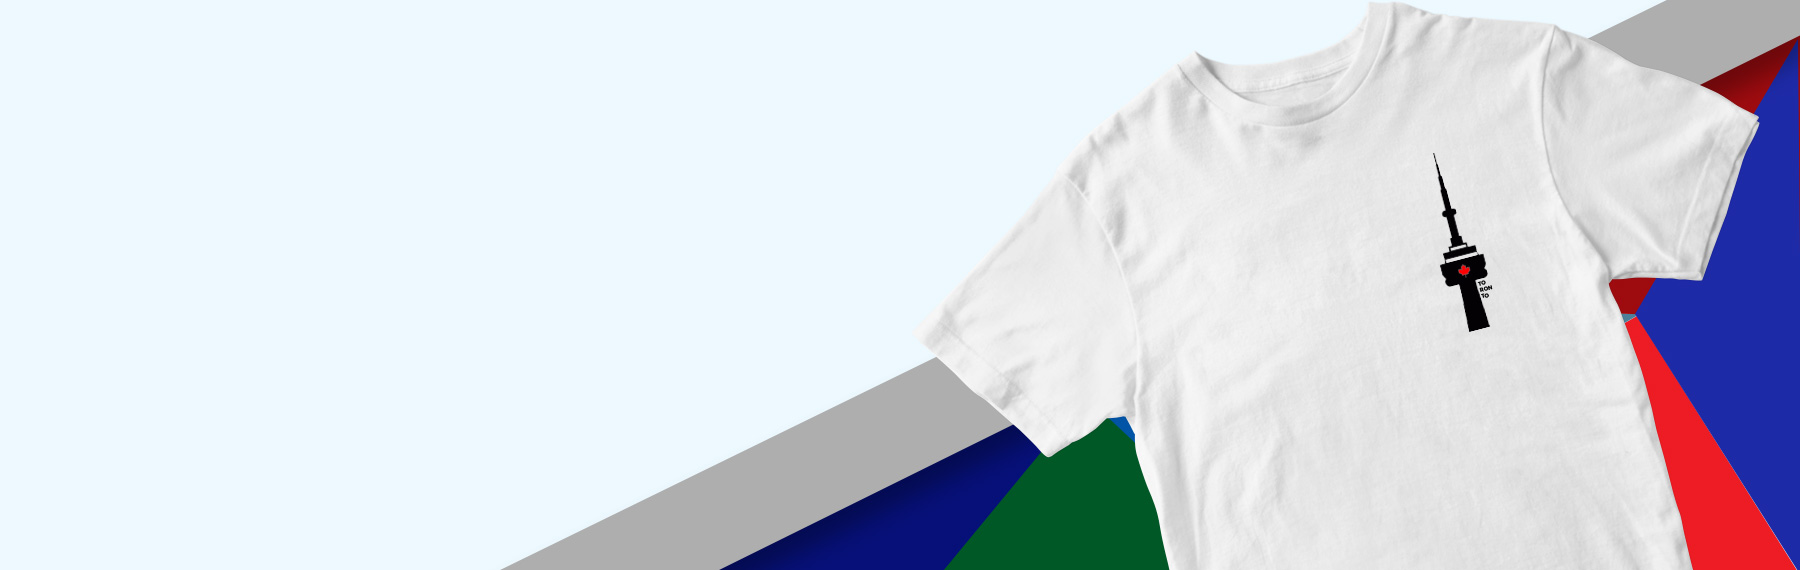 Make T Shirts Toronto Best Photo Shirt Guerillafx